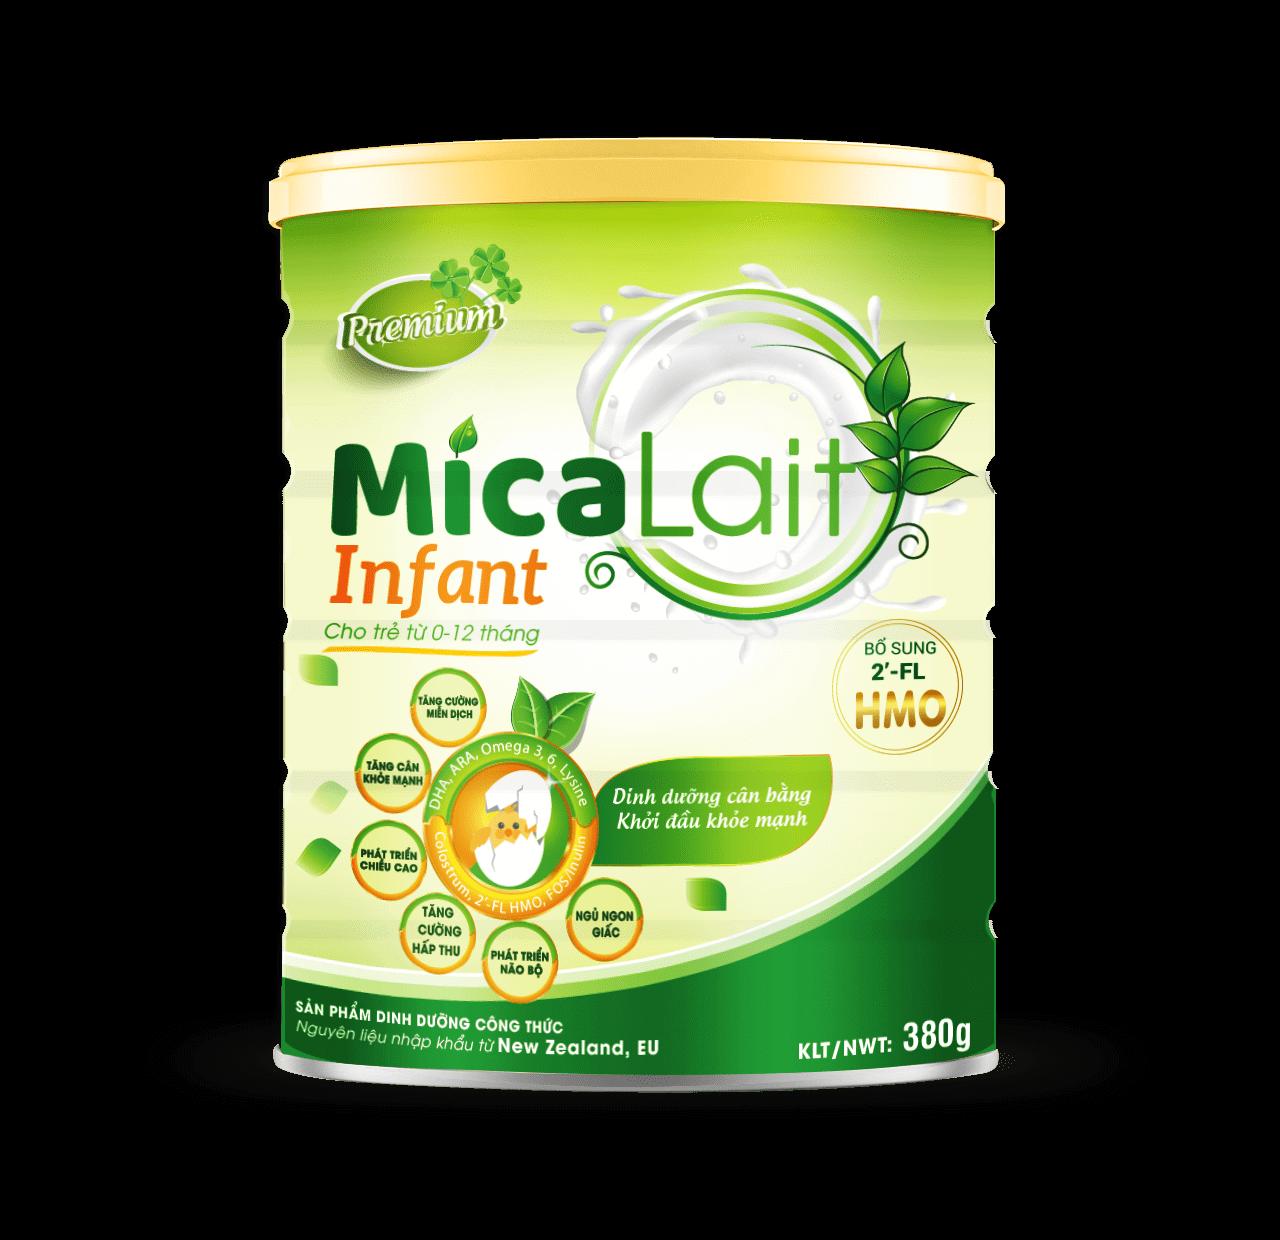 Sữa Micalait Infant